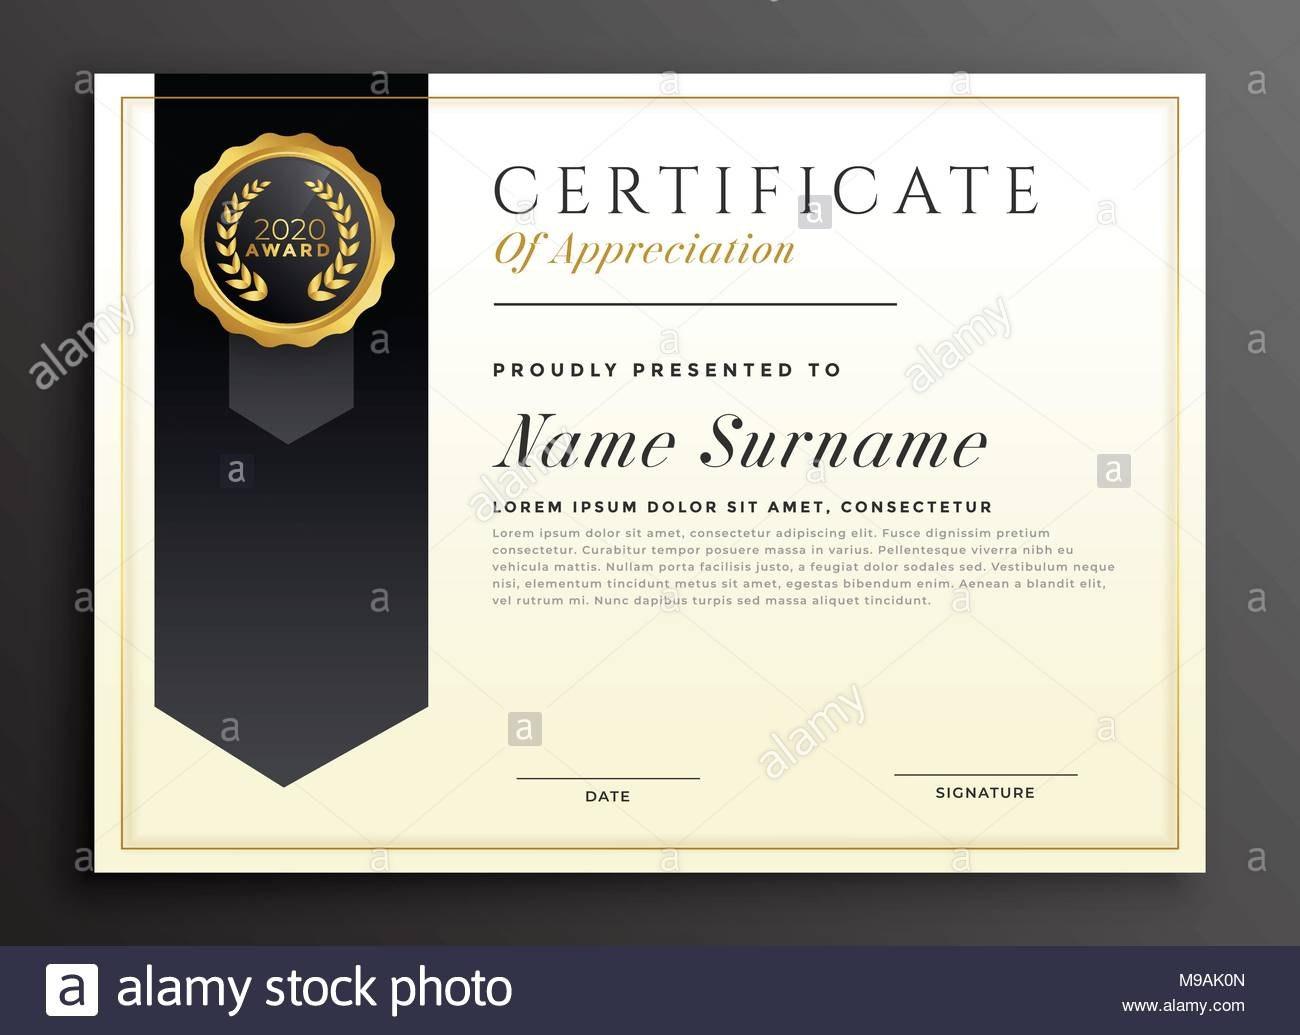 Elegante Diplom Award Certificate Template Design Vektor Abbildung Intended For Professional Award Certificate Template